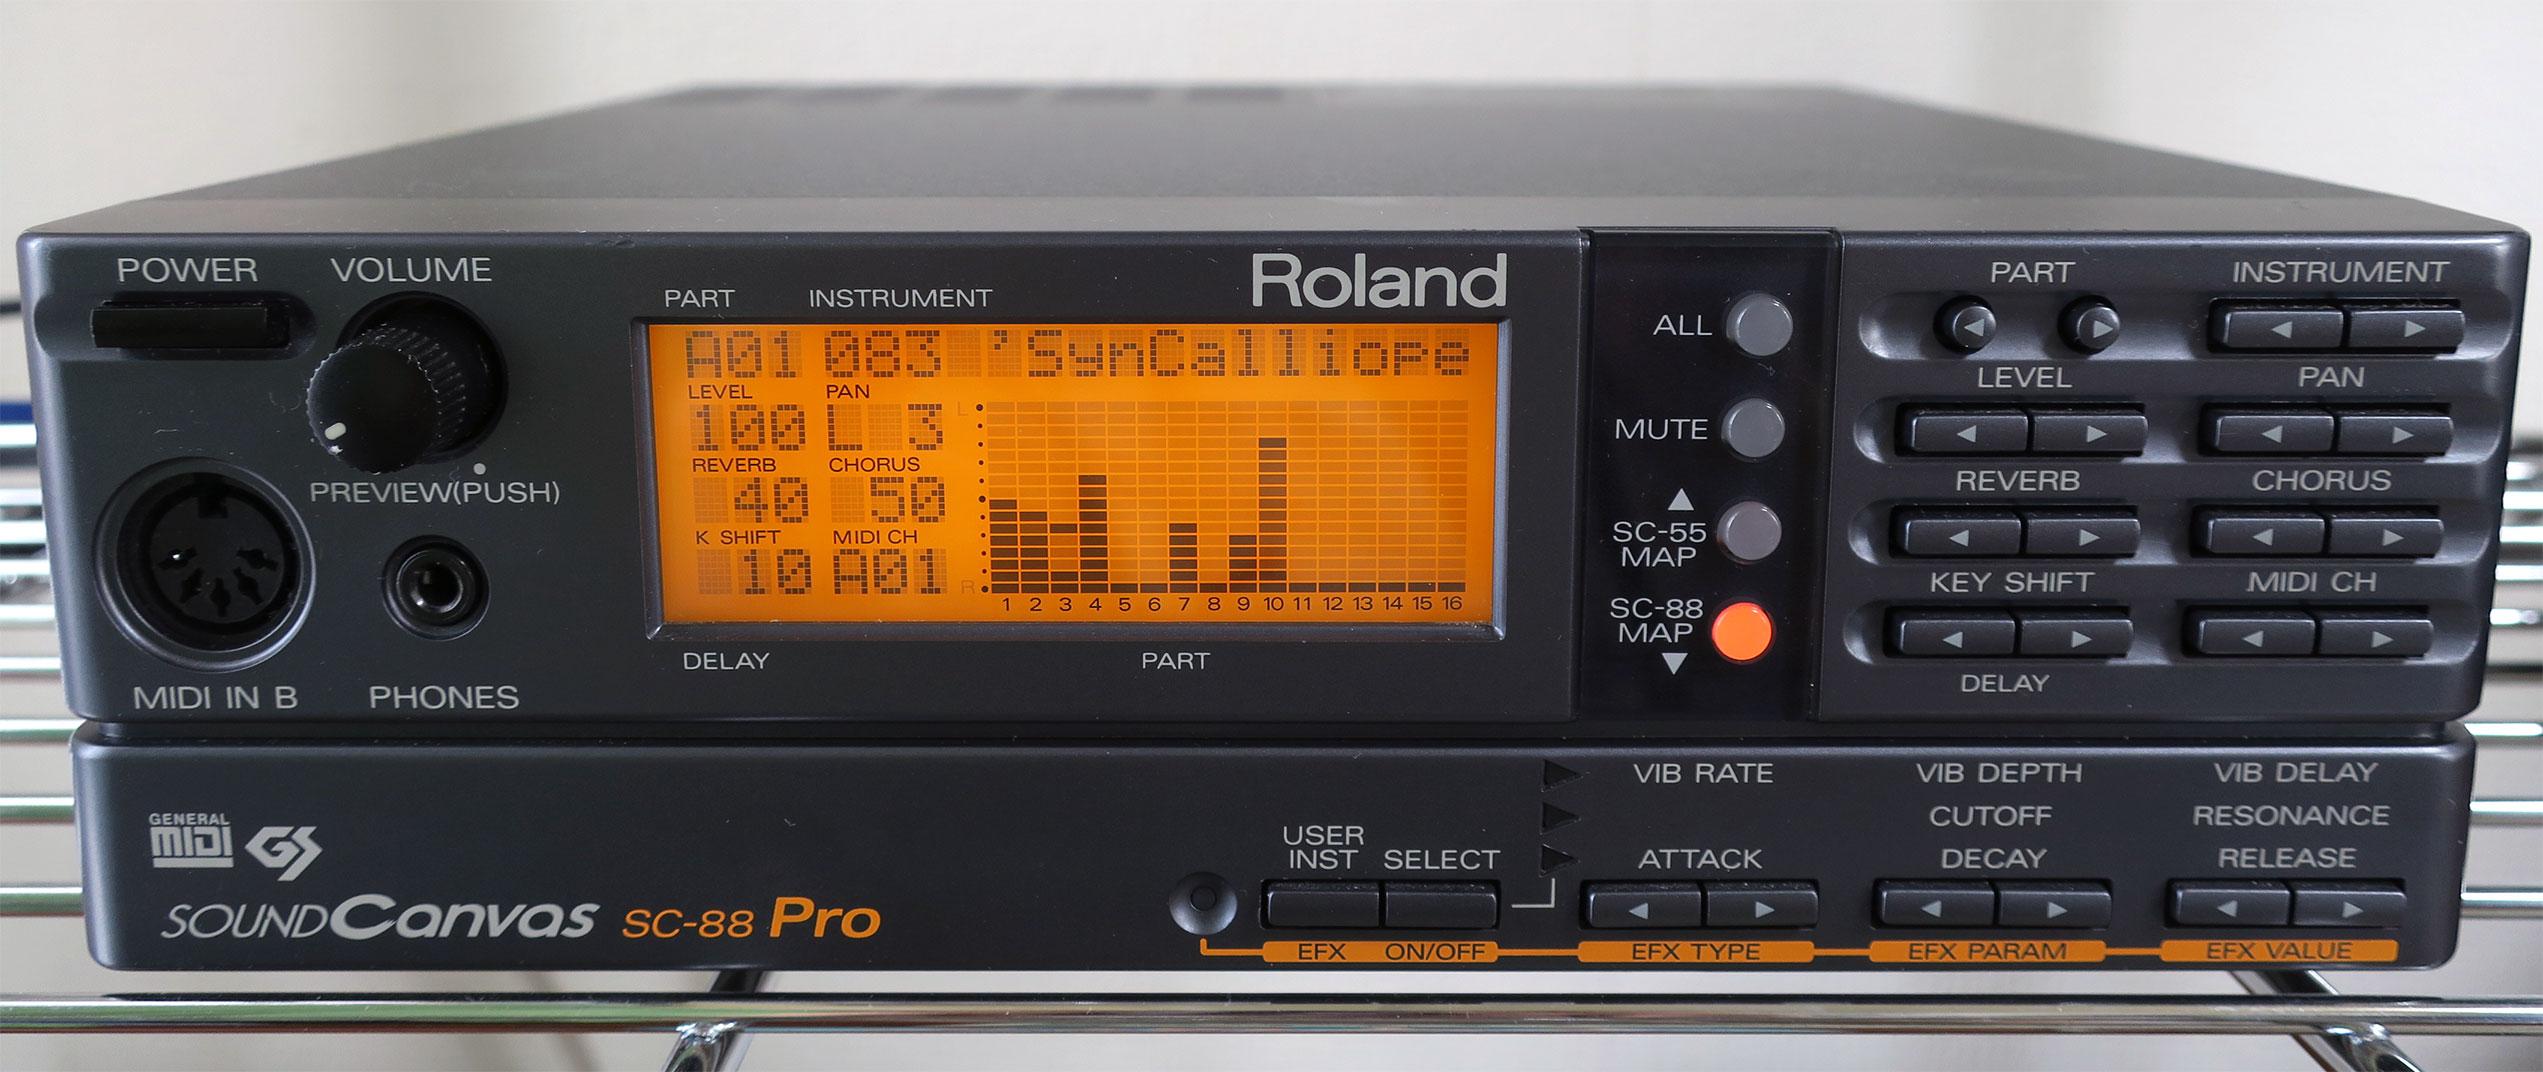 Roland Sound Canvas - Wikipedia